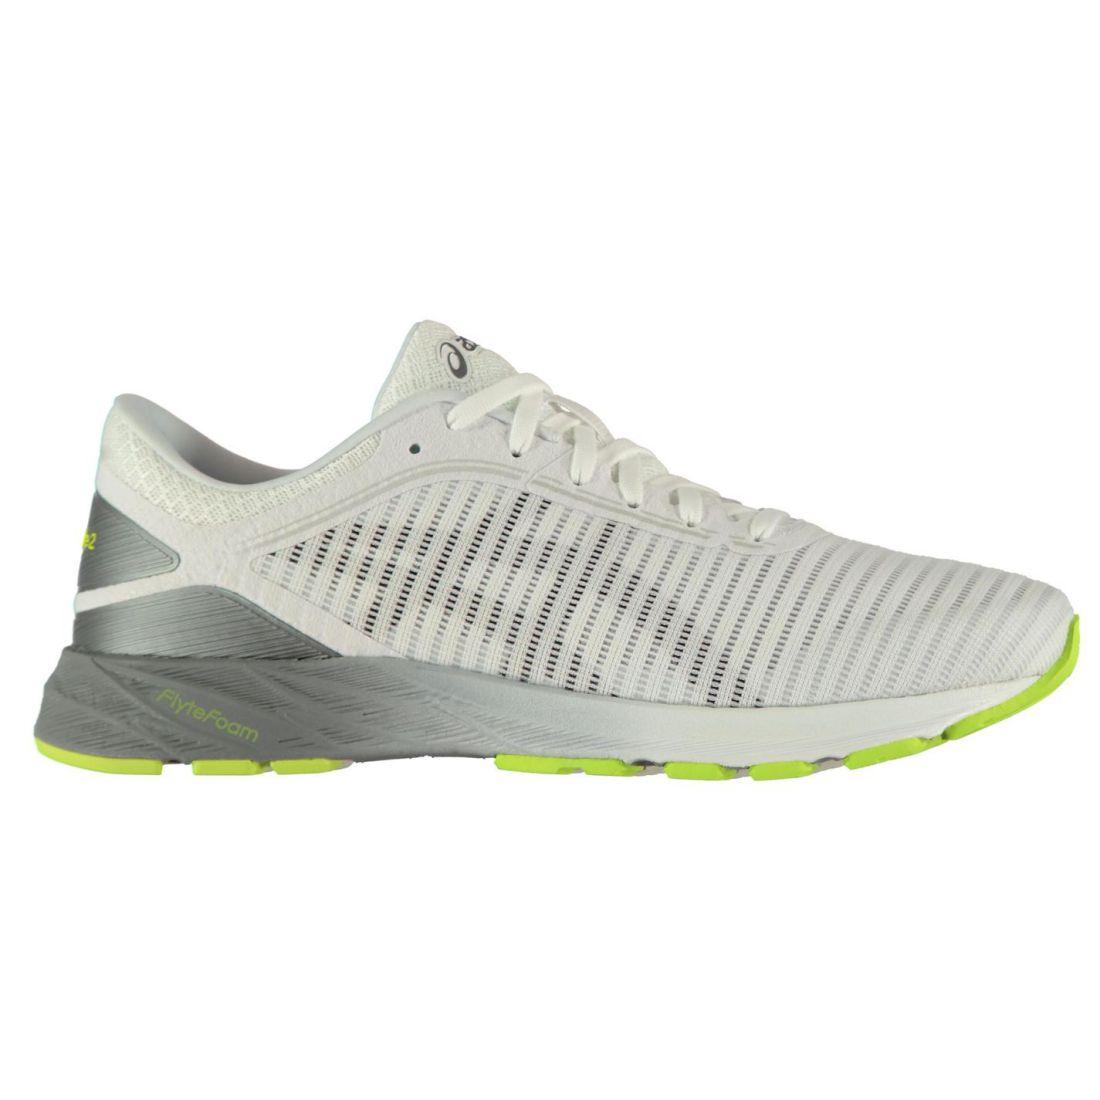 Asics Dynaflyte 2 Running shoes Mens Gents Road Mesh